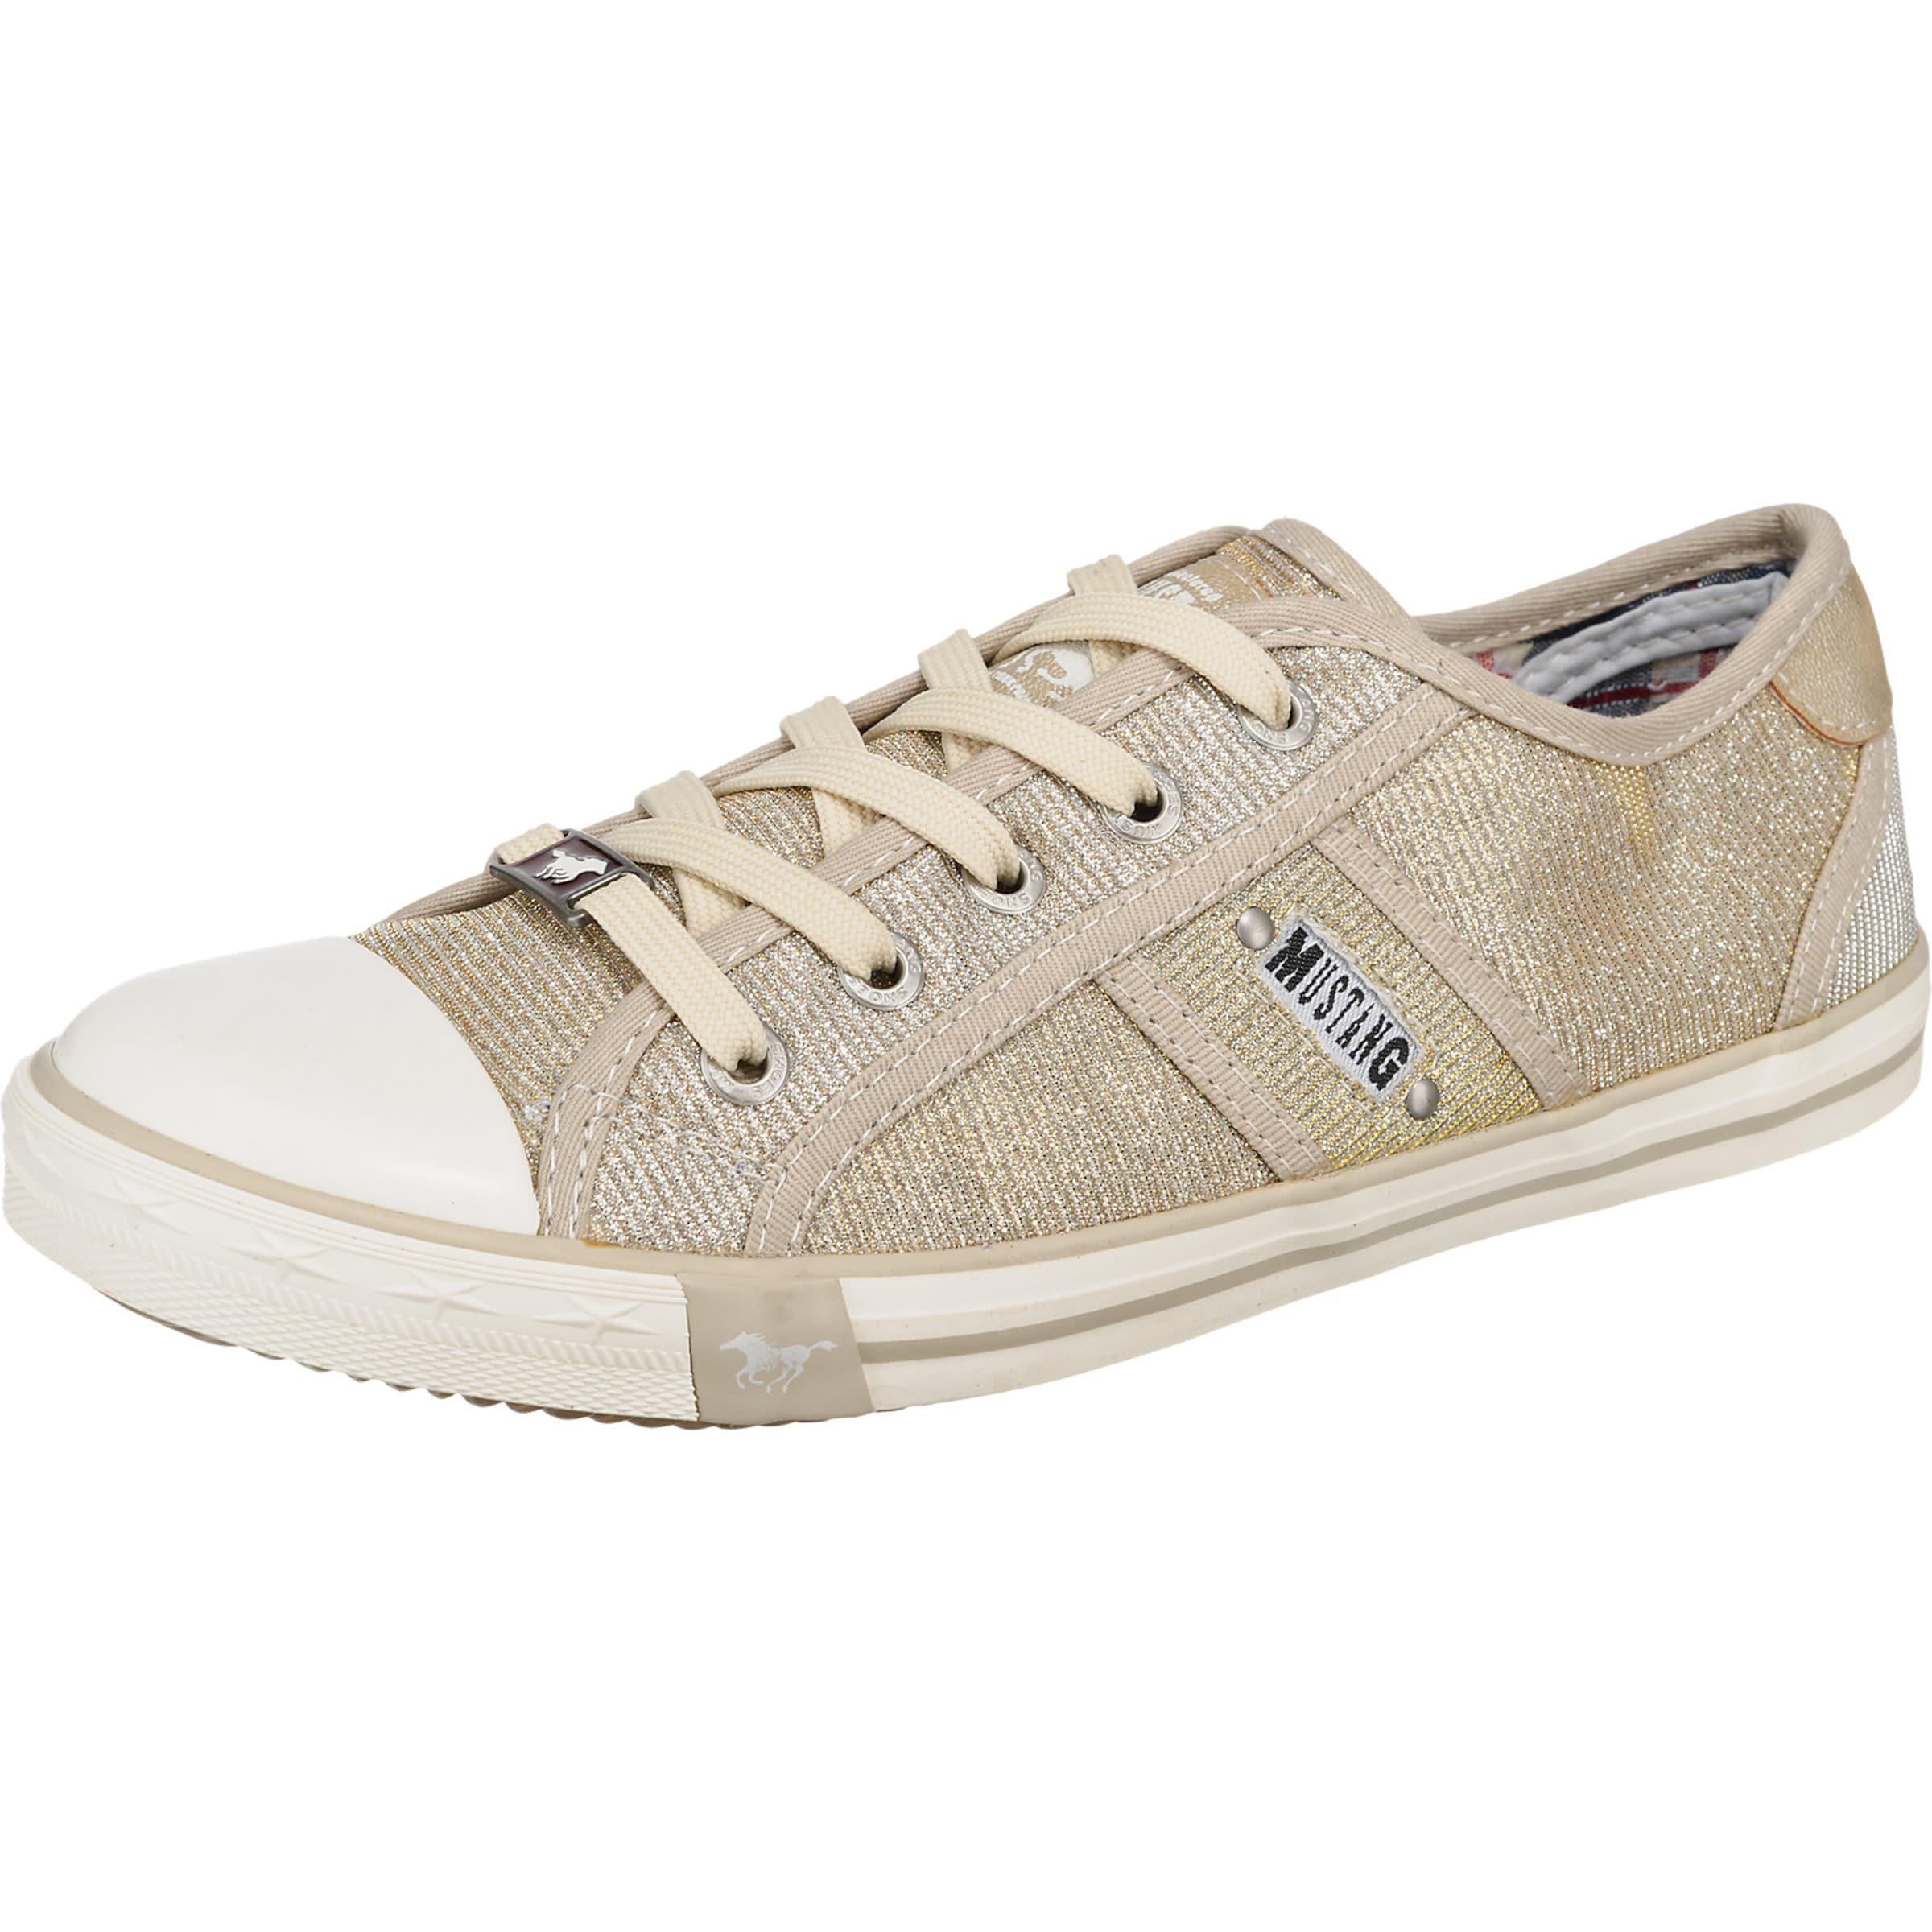 Perfekt Günstiger Preis MUSTANG Sneakers Günstiger Online-Shop jFhXR9mLh